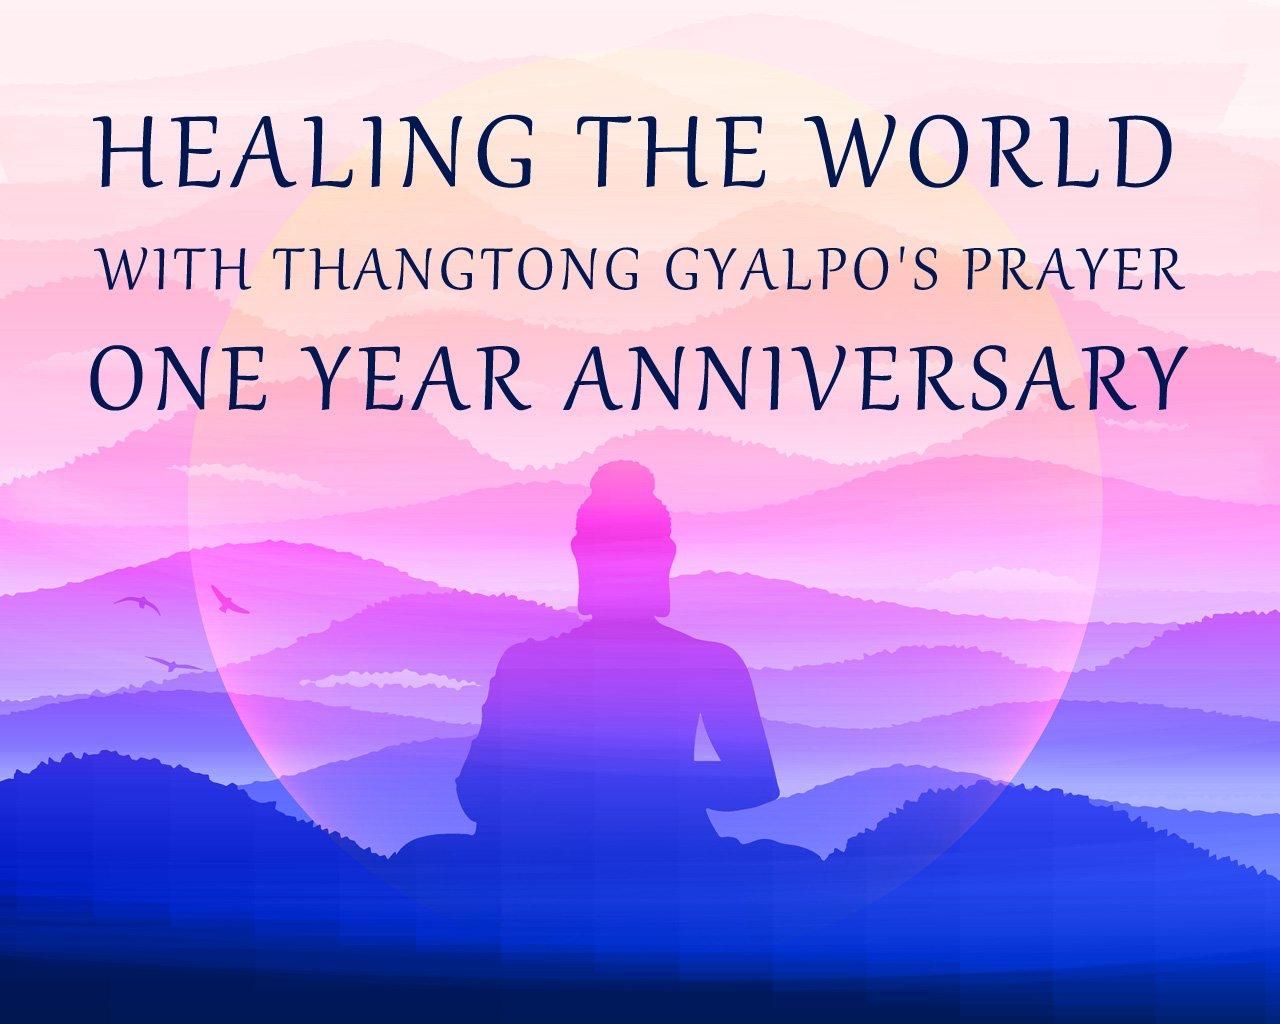 Poster for one-year anniversary of Thangtong Gyalpo Prayerathon